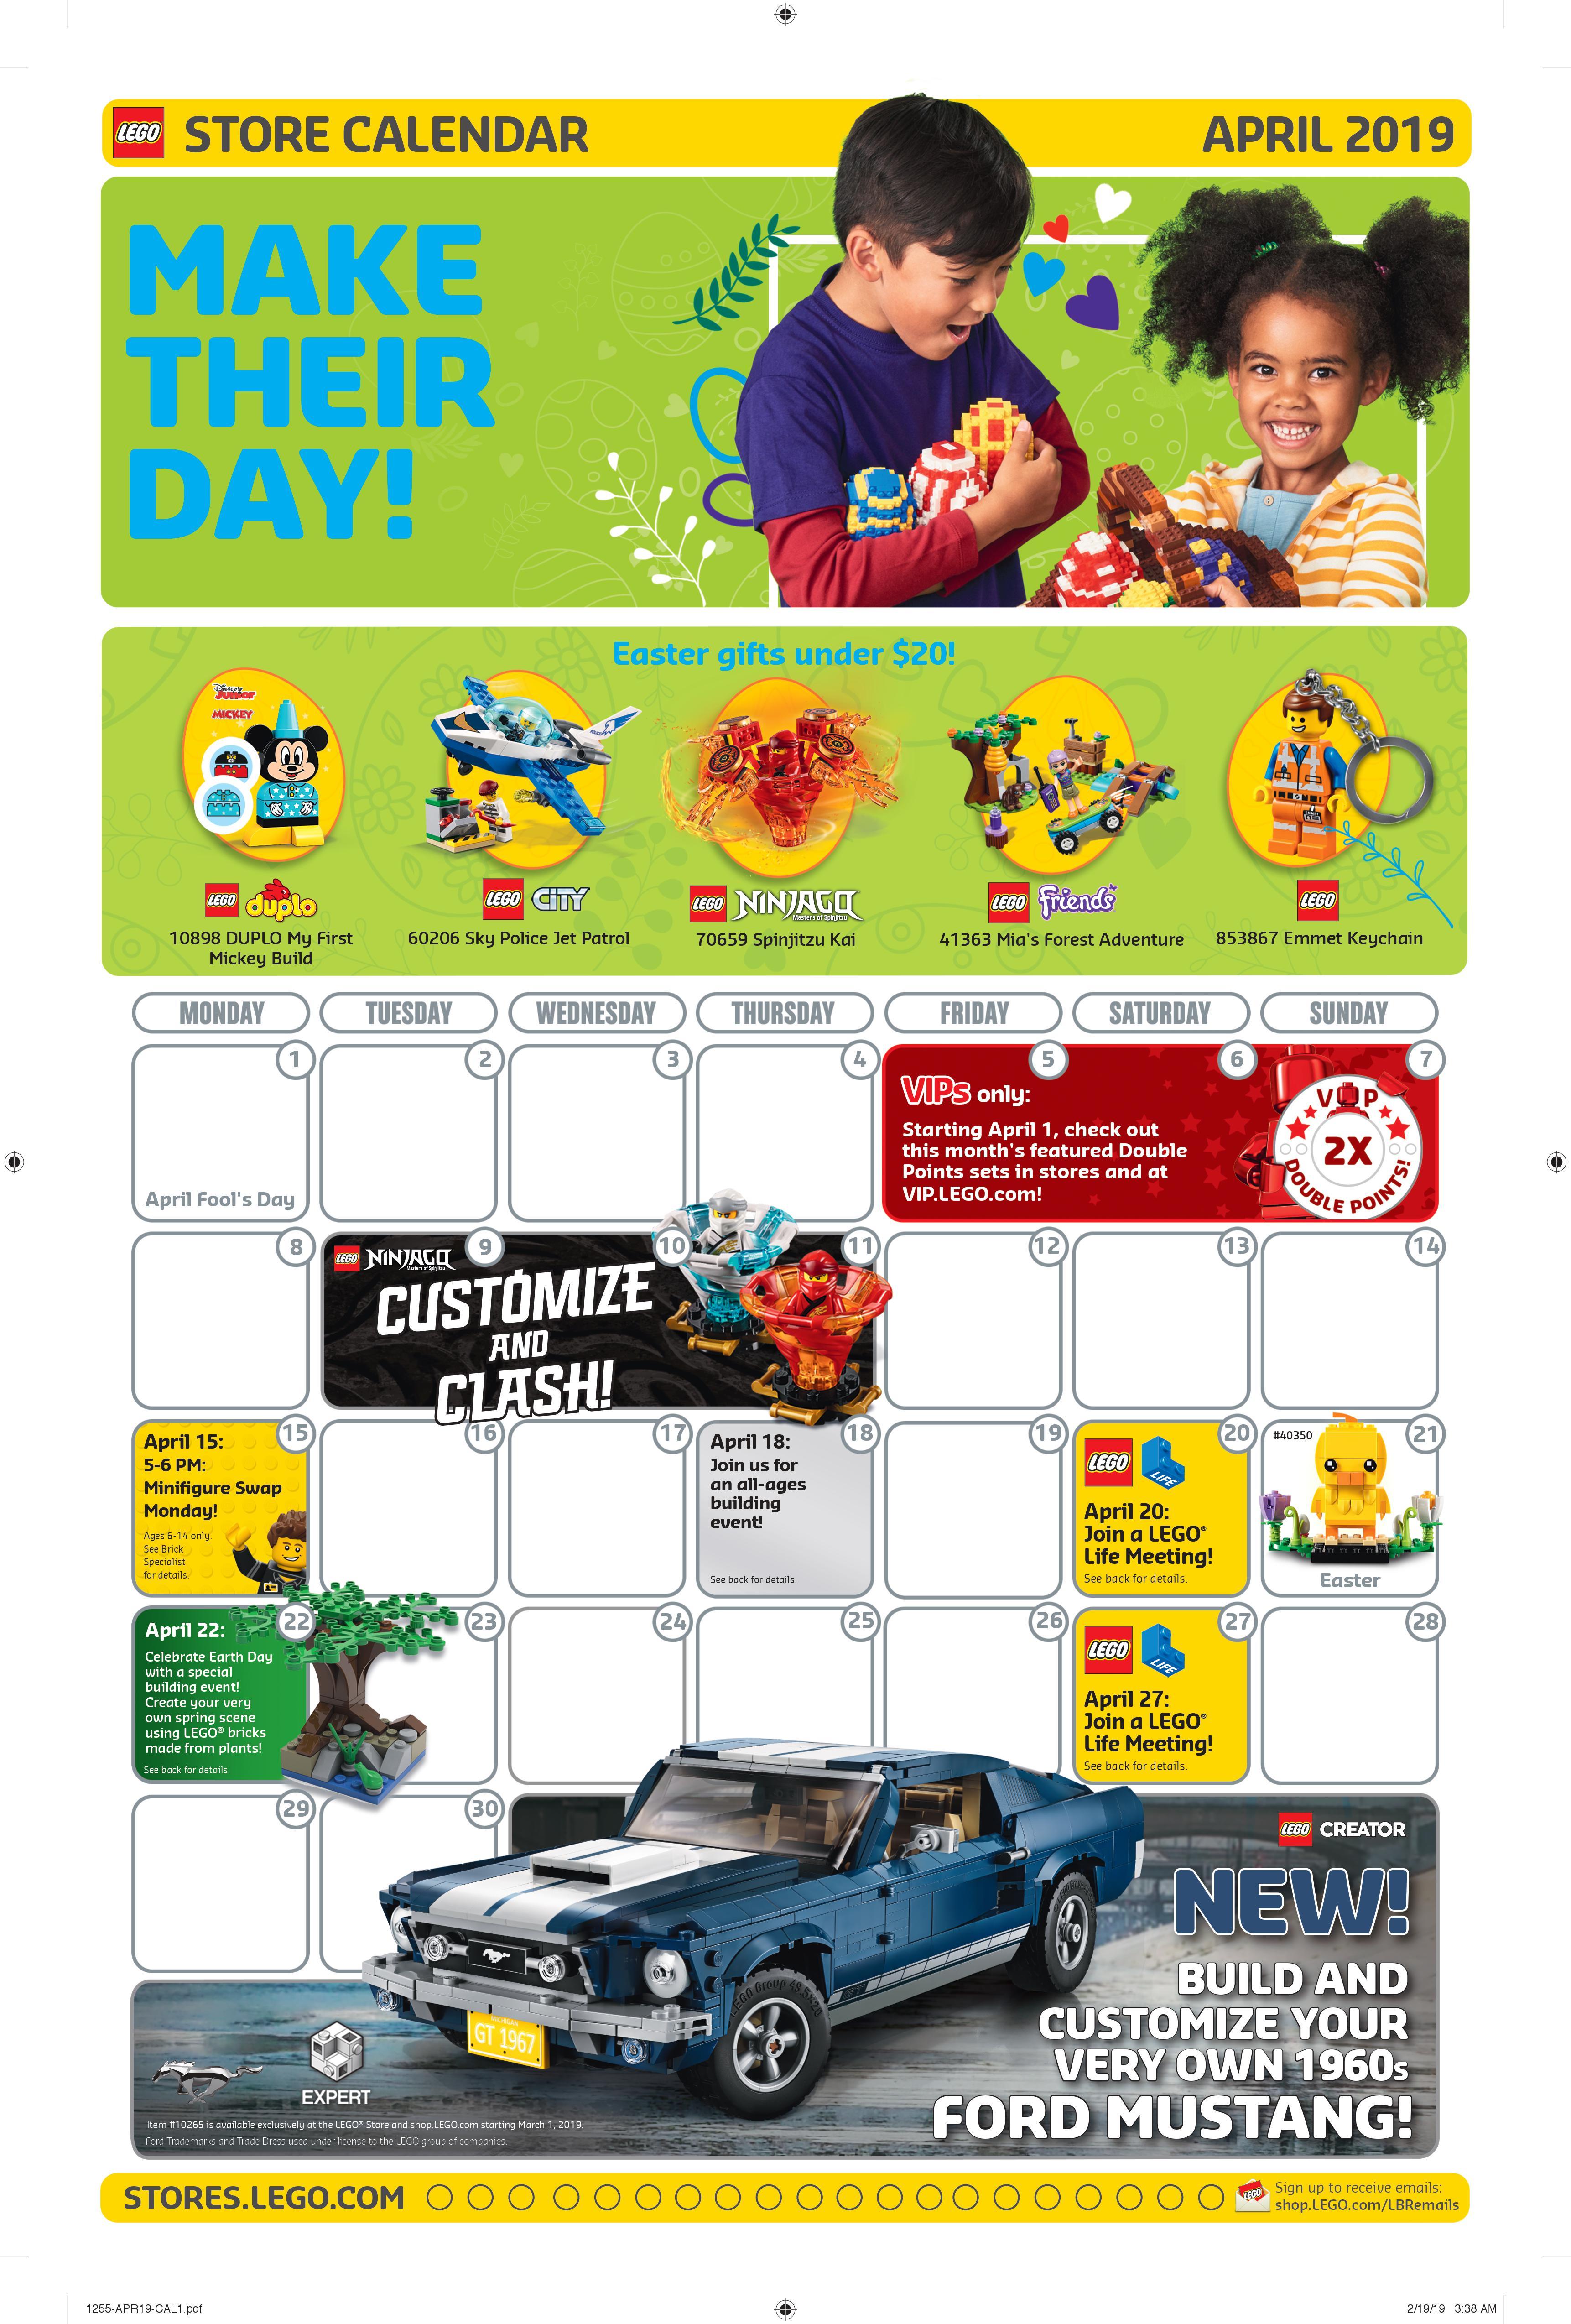 Lego April 2022 Calendar.Lego April 2019 Store Calendar Promotions Events The Brick Fan